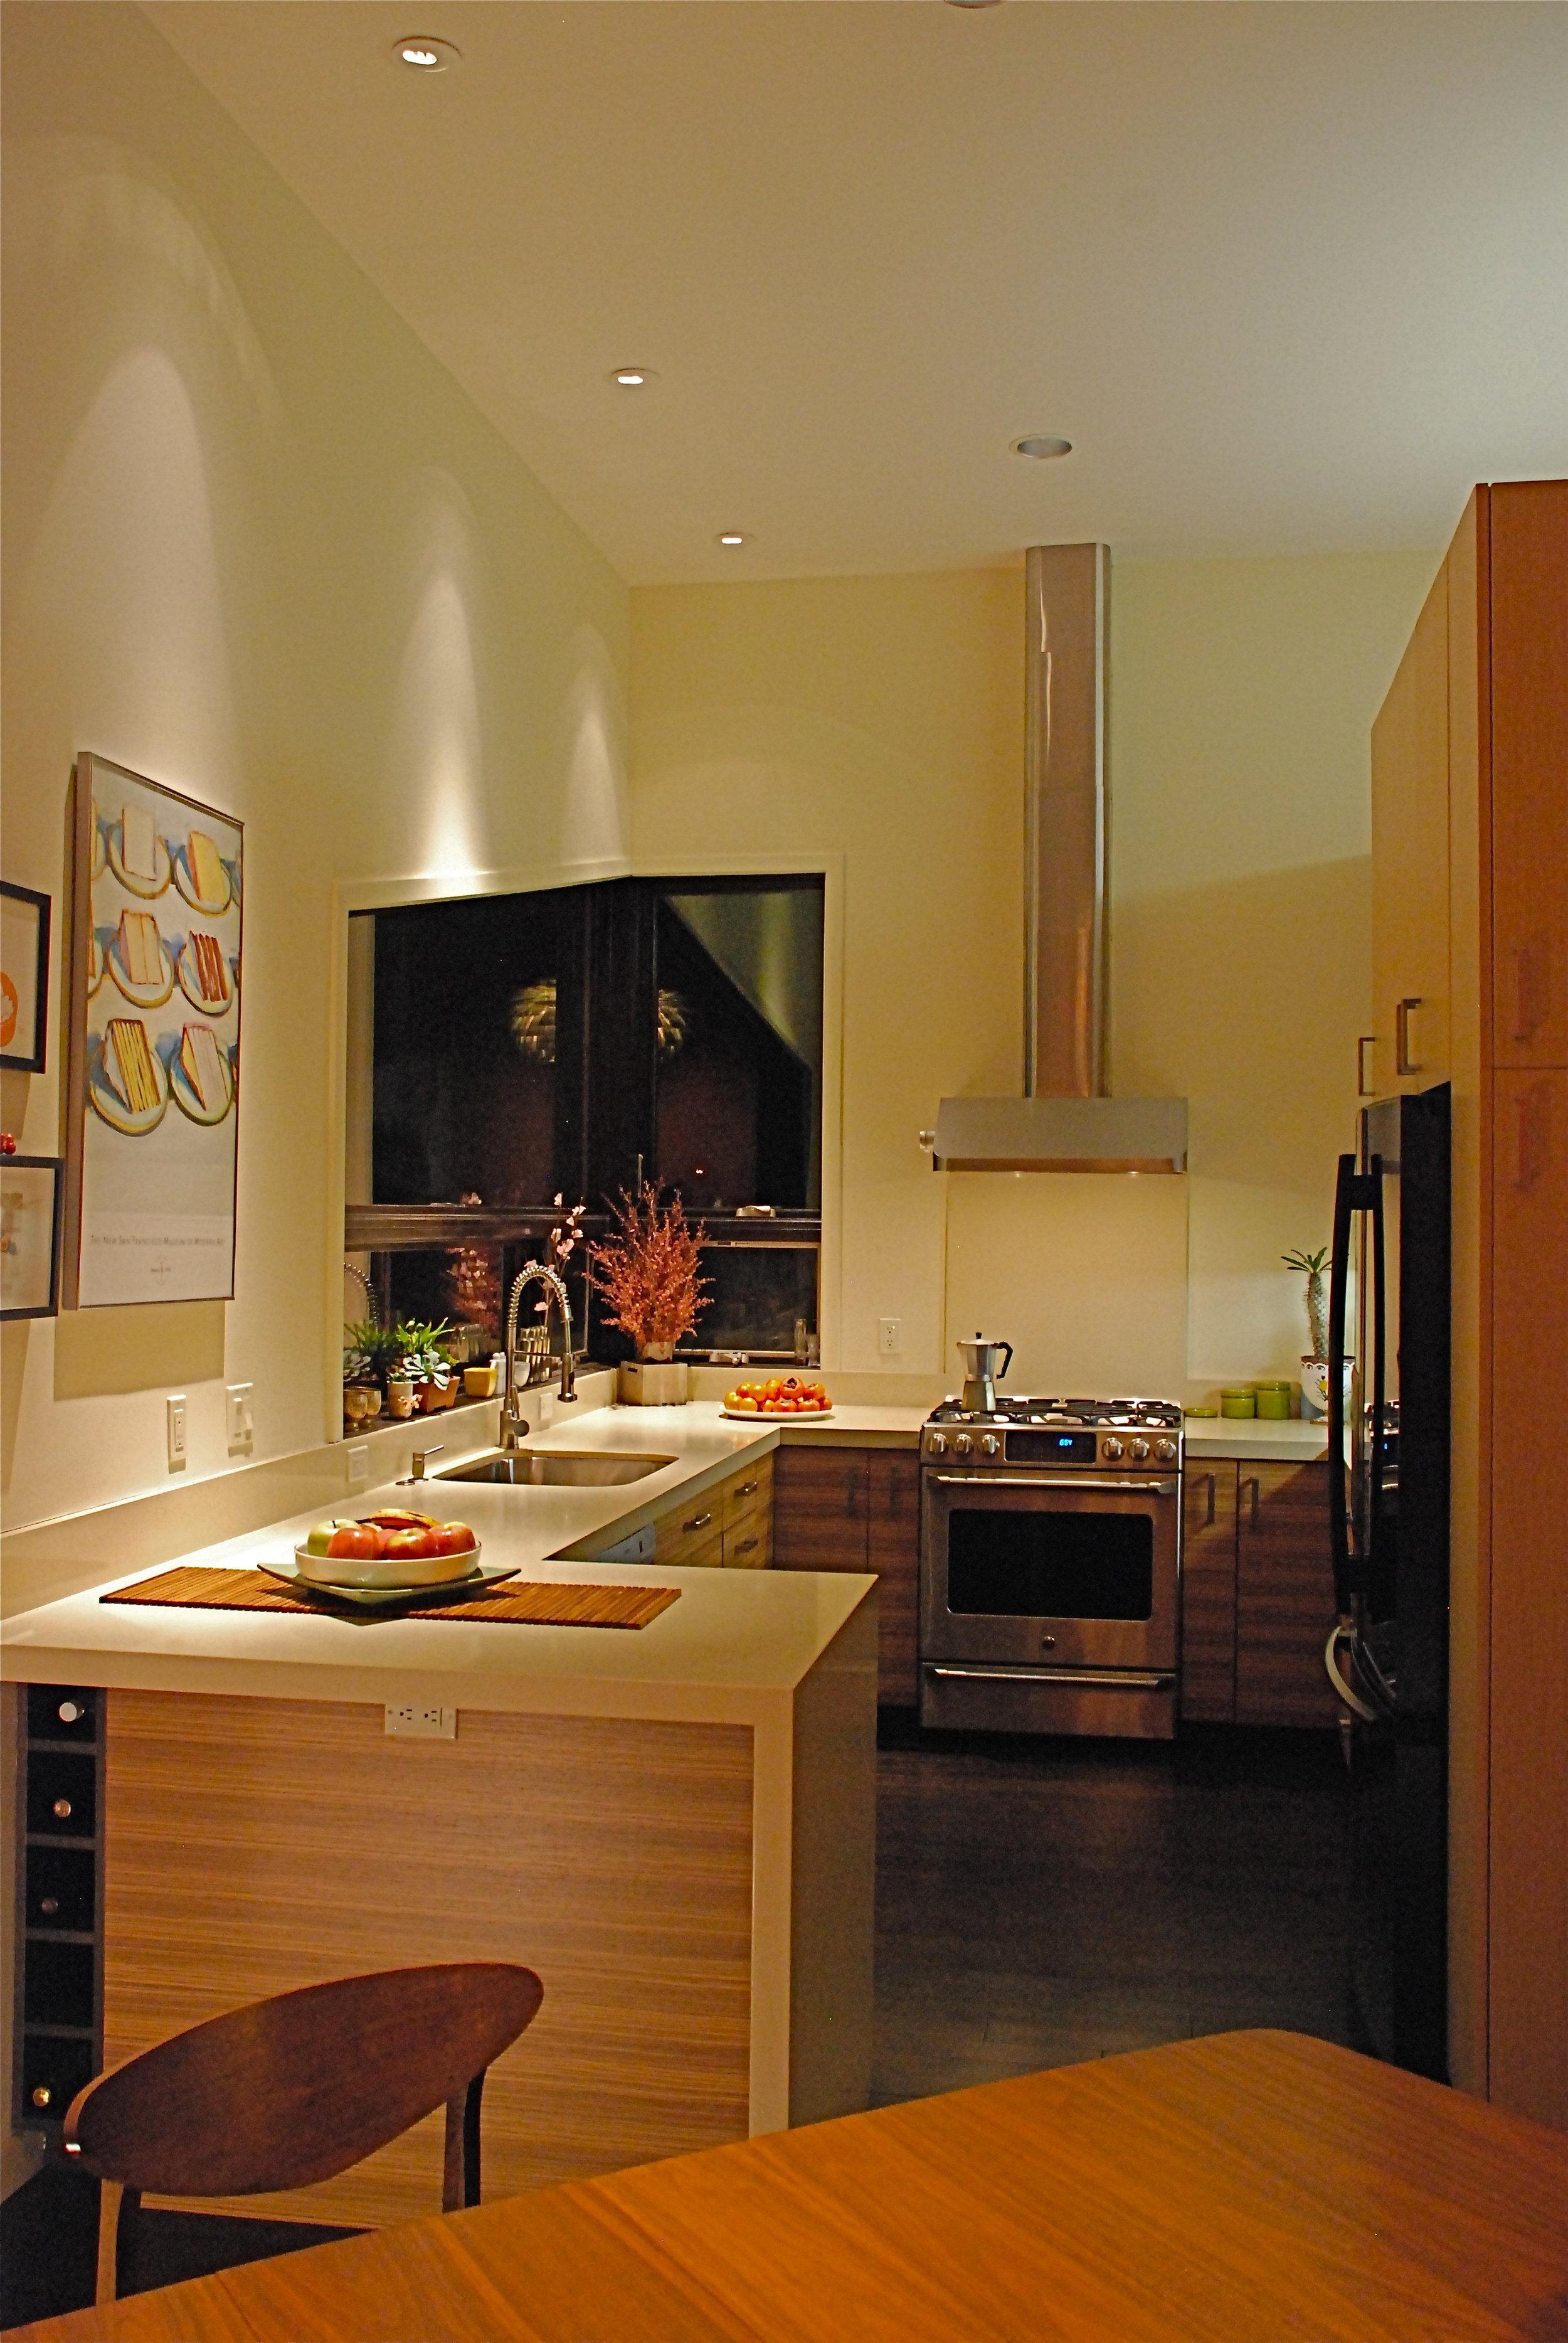 Sun Kitchen.JPG